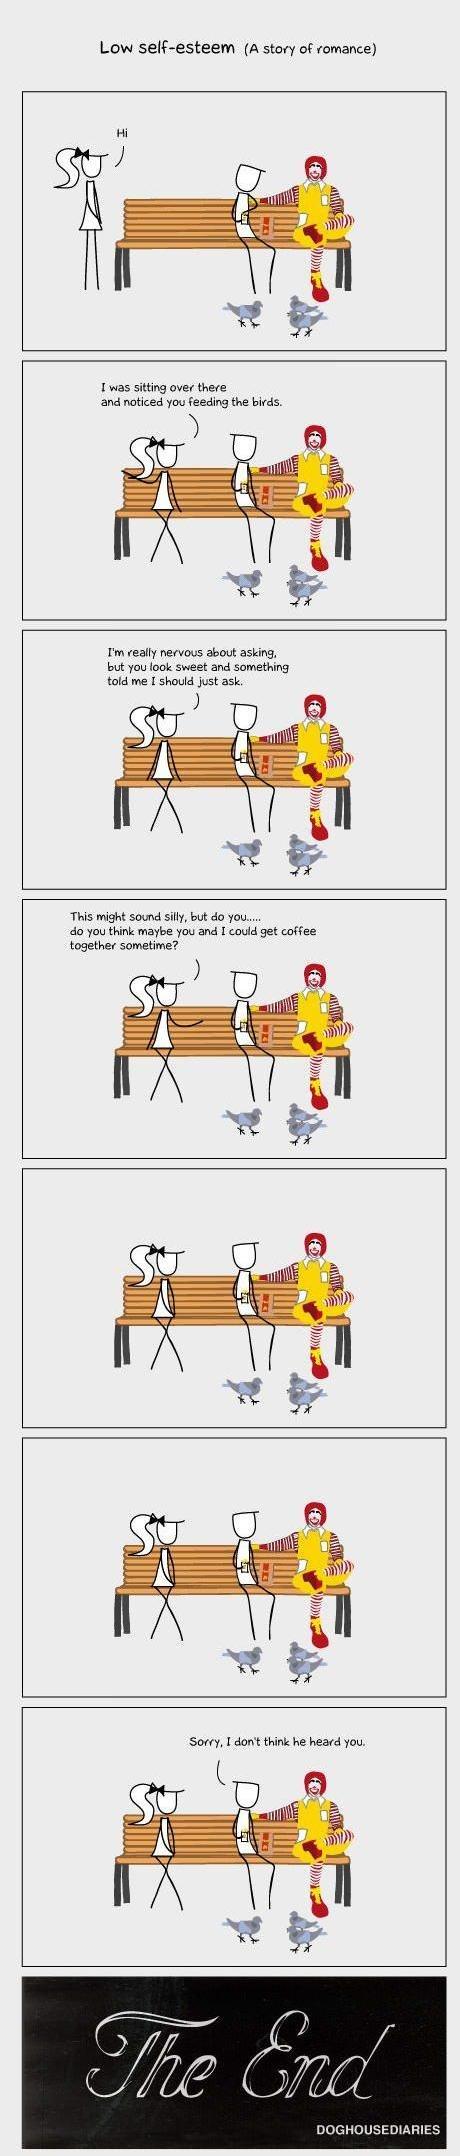 low self esteem. obsessed with April Gutierrez: www(dot)theleek(dot)com/2013/04/marry-me-april-gutierrez-14-hot-pics/. Low (A story romance] I was oi . ova were funny comics self esteem humor McDonalds comedy